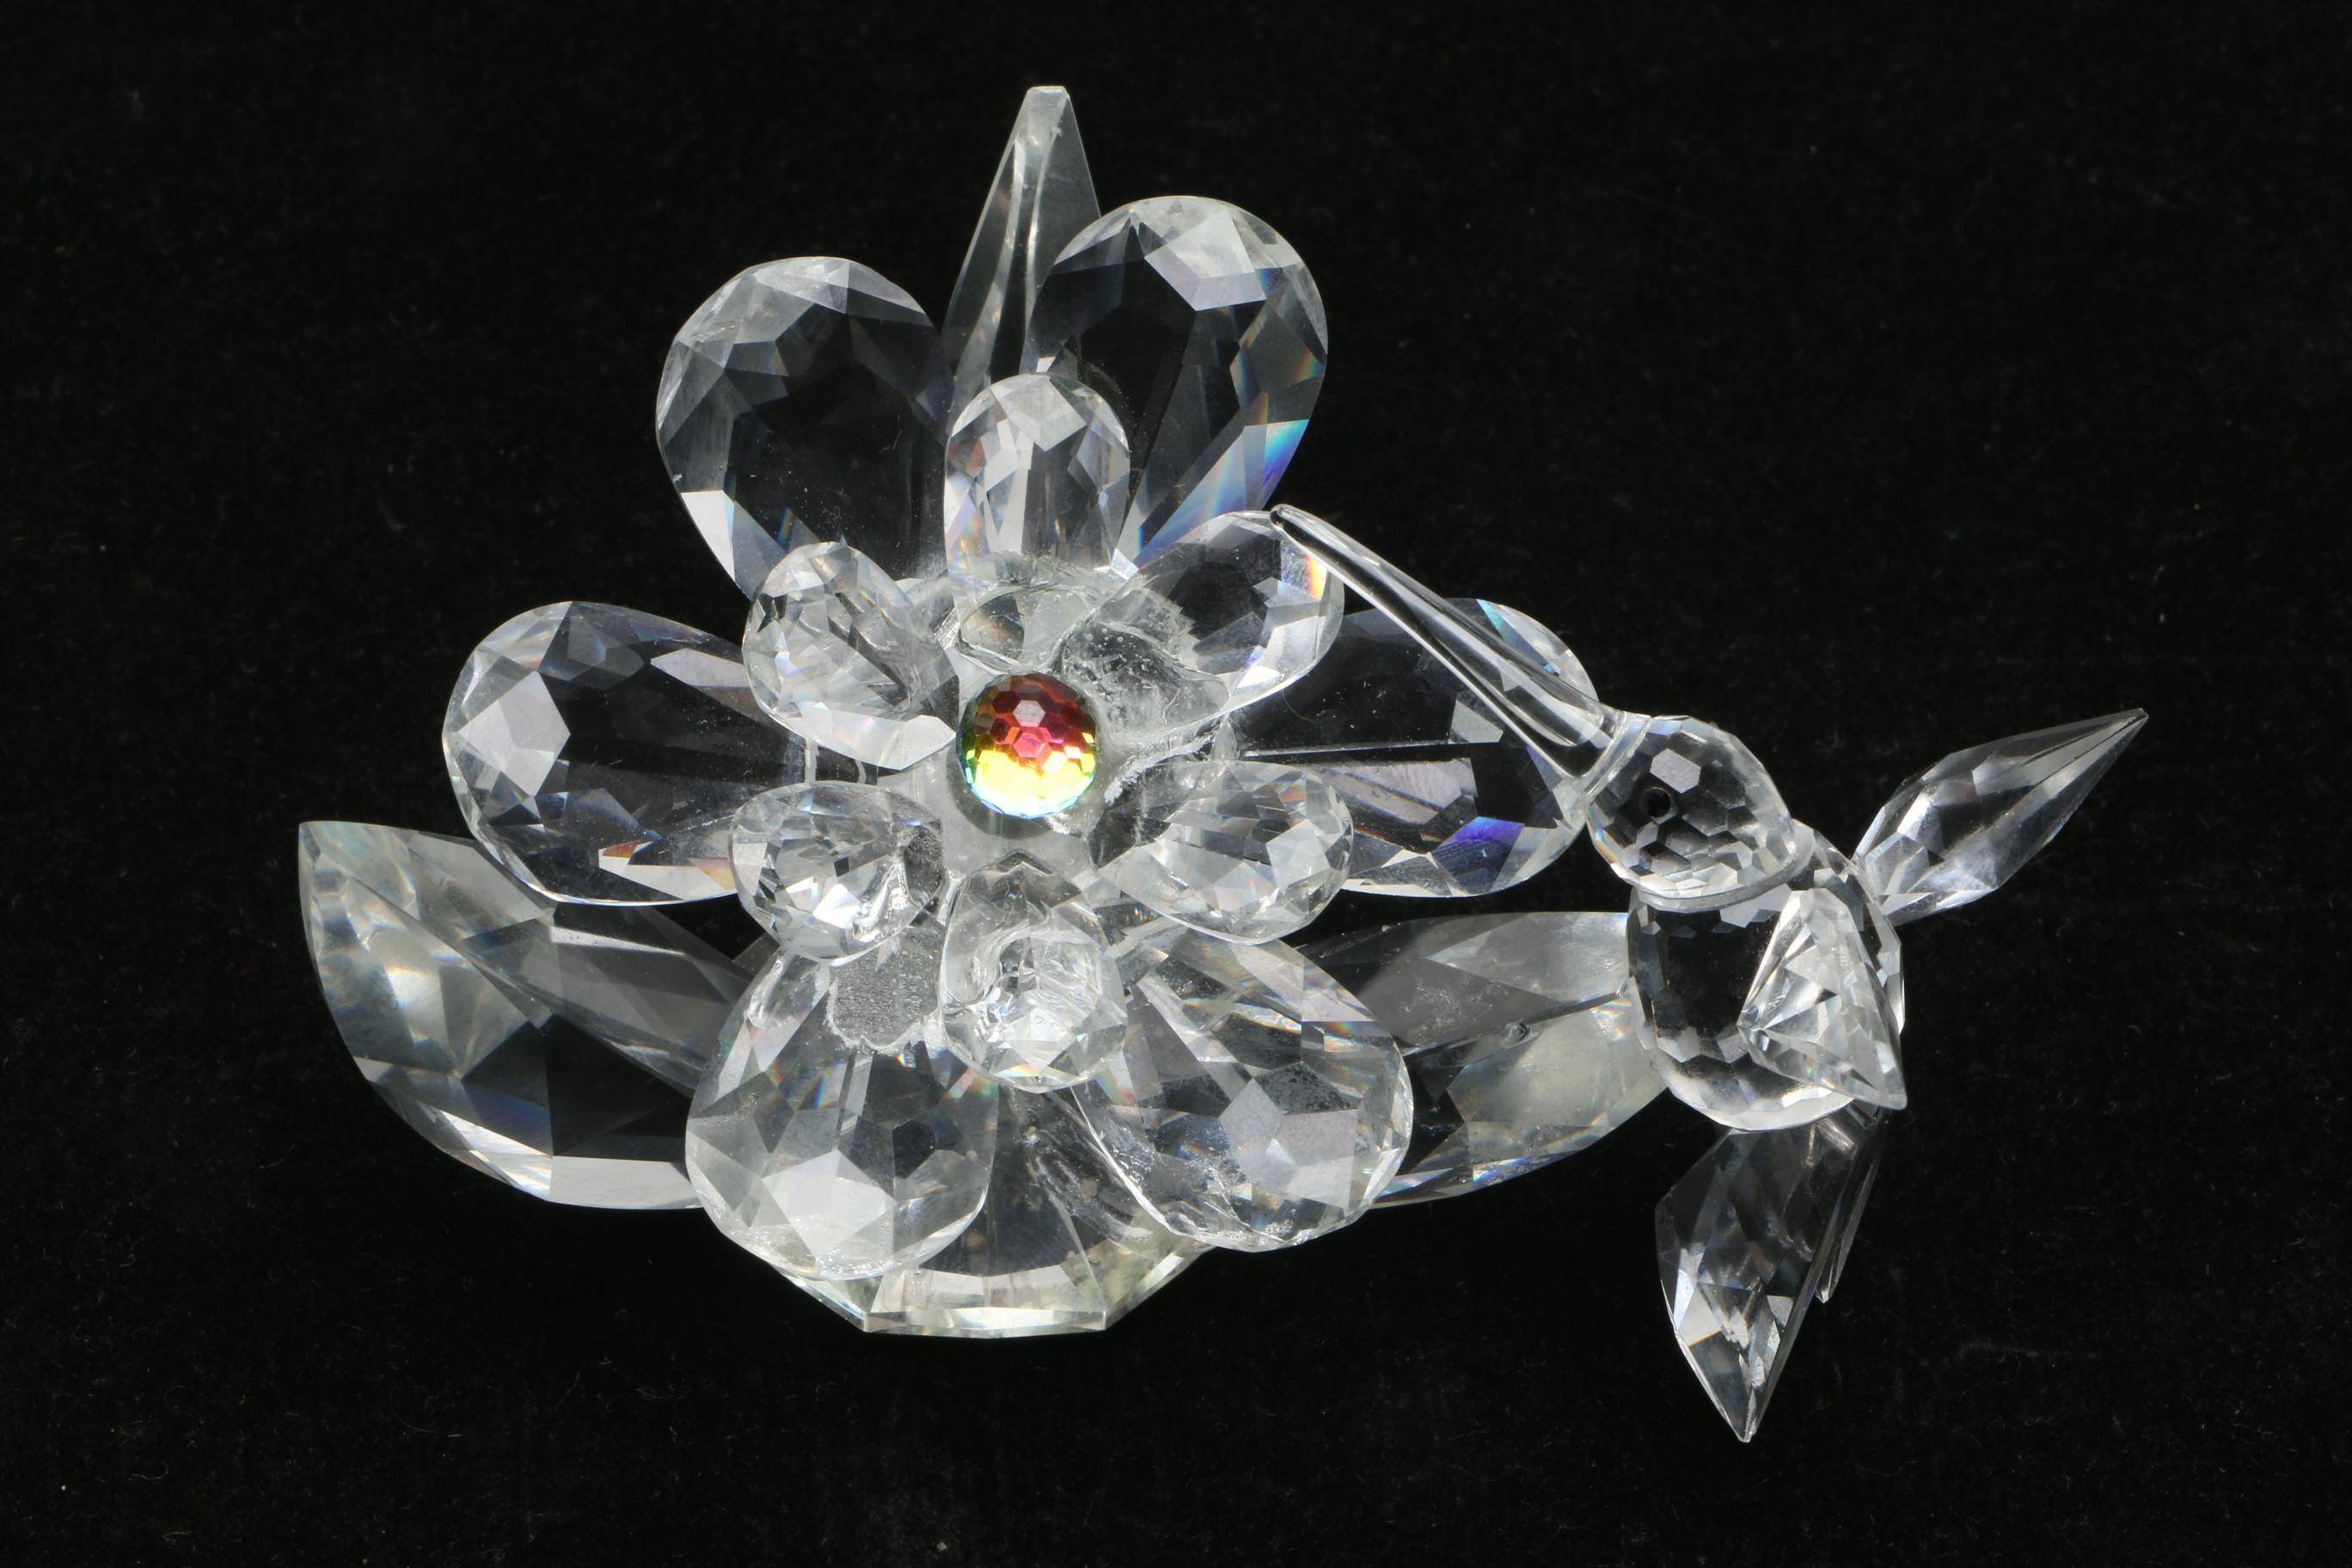 Vintage Swarovski Iris Arc Crystal Humming Bird and Flower Figurine